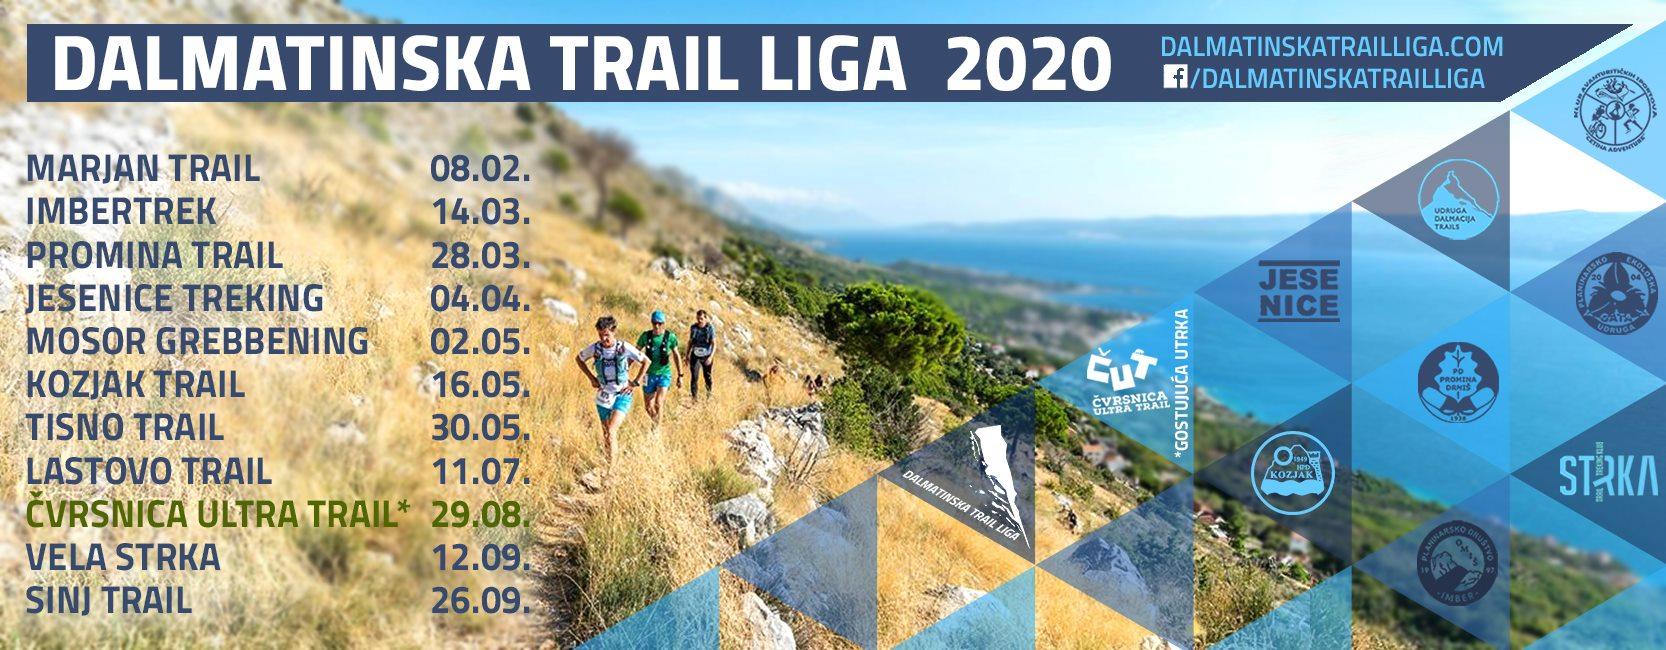 Bit ćemo dio Dalmatinske Trail Lige!